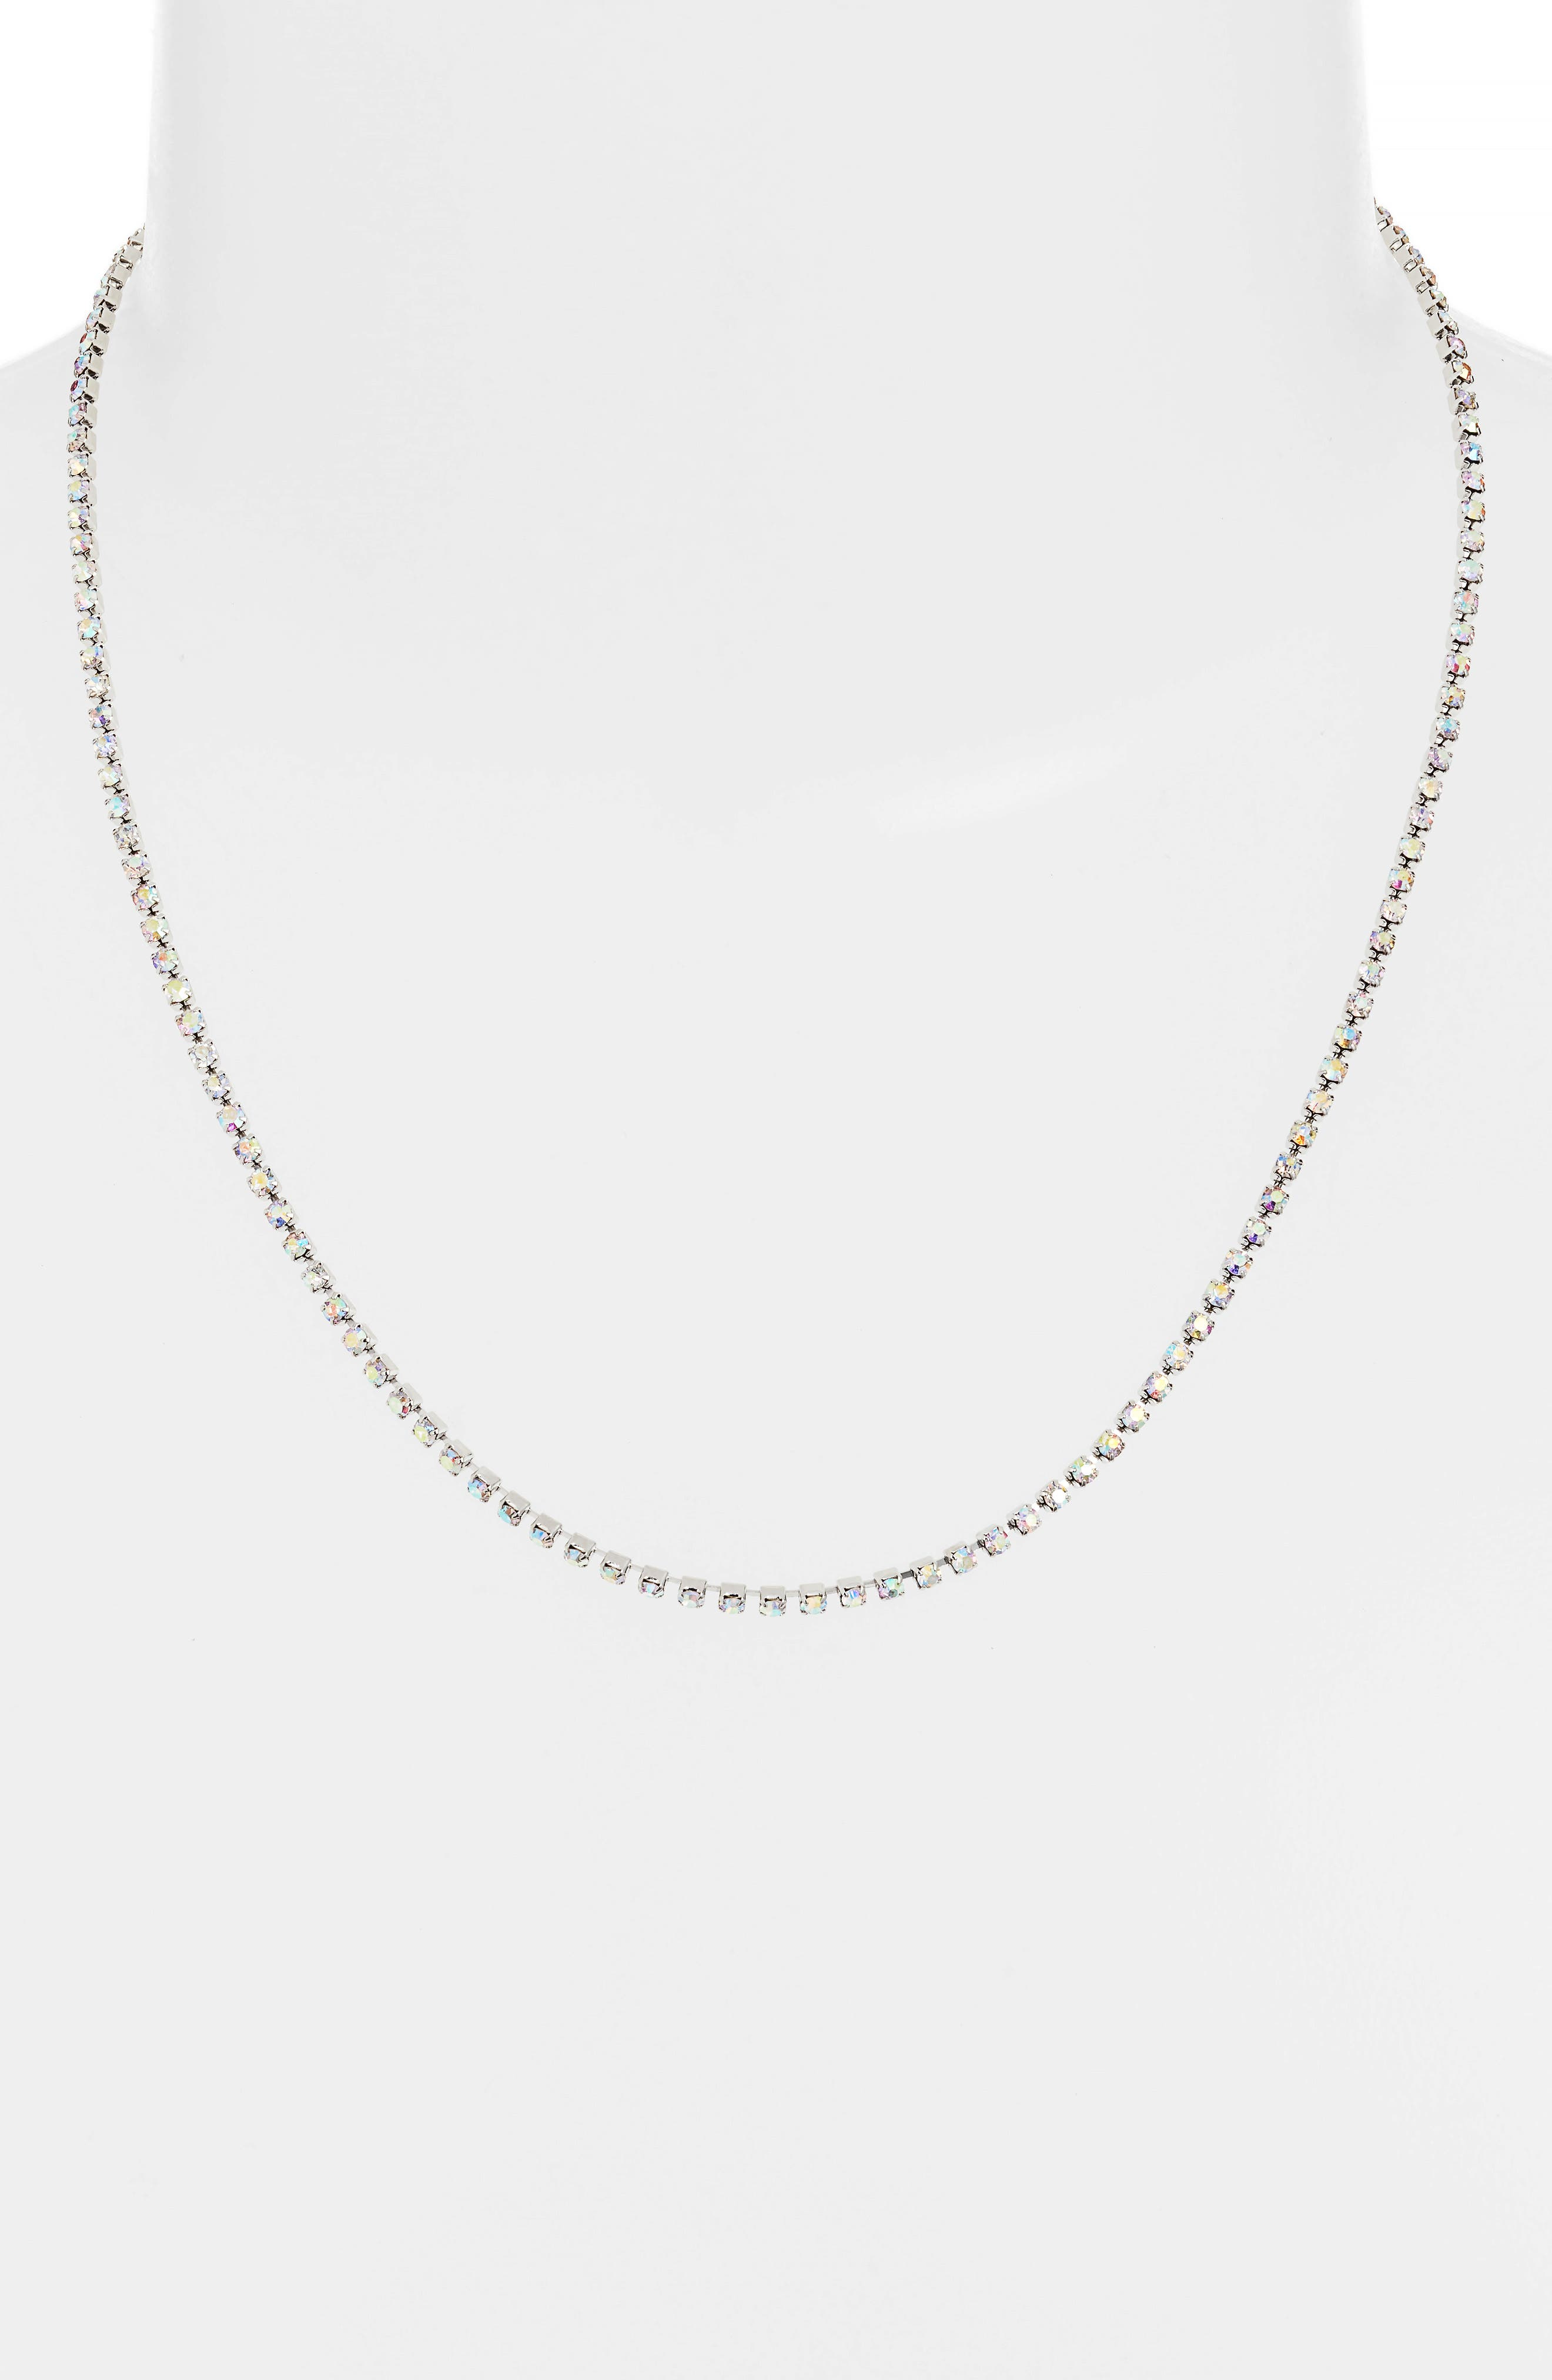 SOMETHING NAVY,                             Rhinestone Necklace,                             Alternate thumbnail 2, color,                             CLEAR- RHODIUM